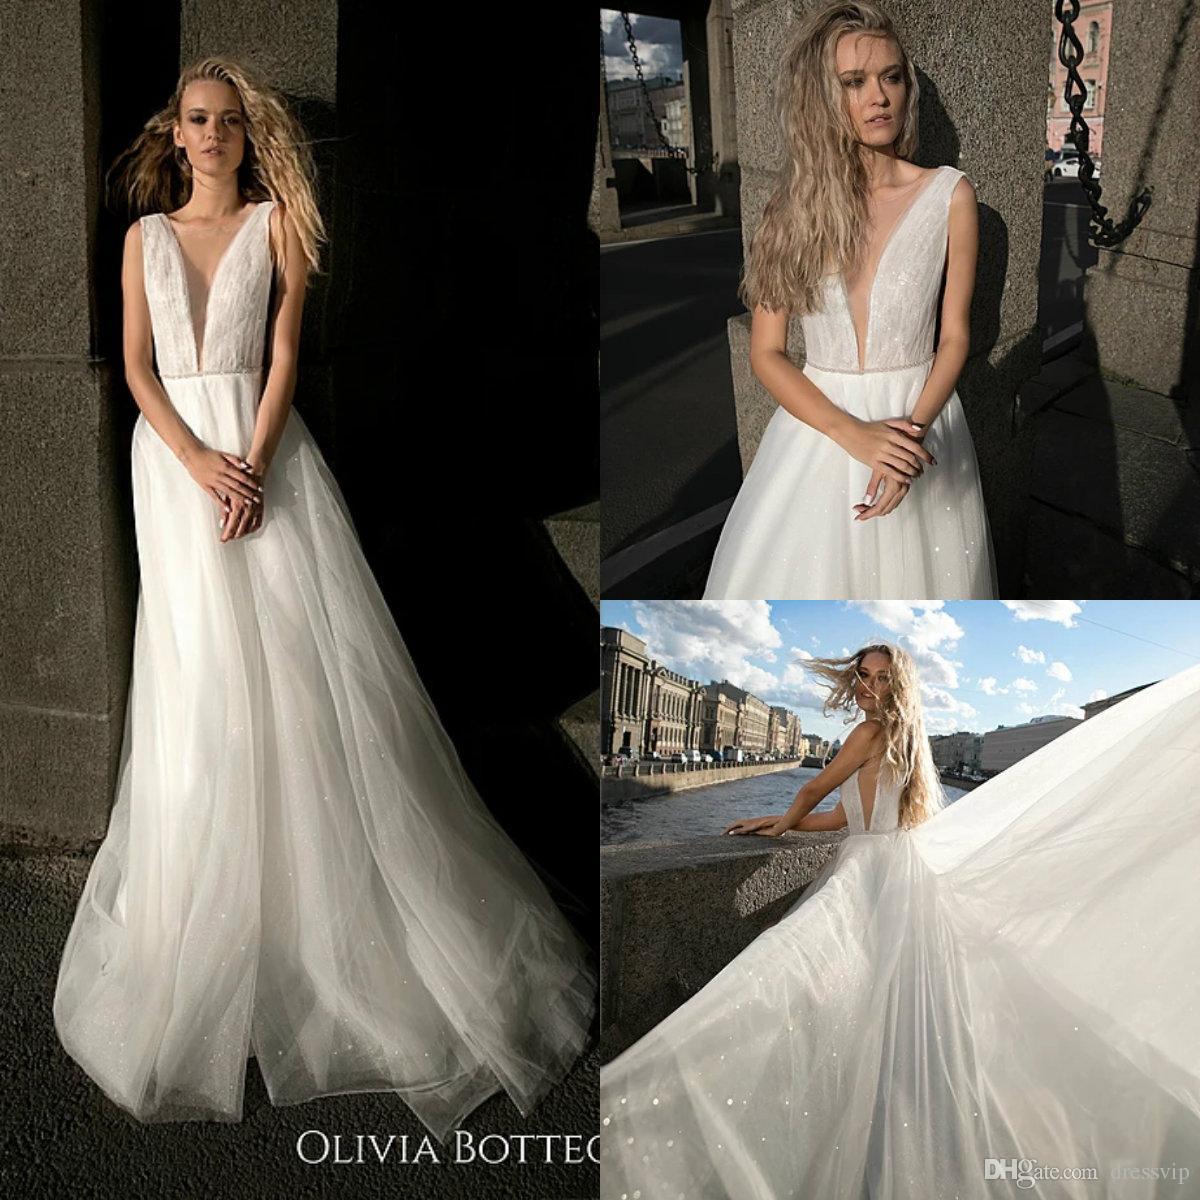 2829415f2f Discount 2019 A Line Beach Wedding Dresses Deep V Neck Sleeveless Glitter  Sequins Sweep Train Boho Wedding Dress Custom Made Bohemian Bridal Gowns  Second ...